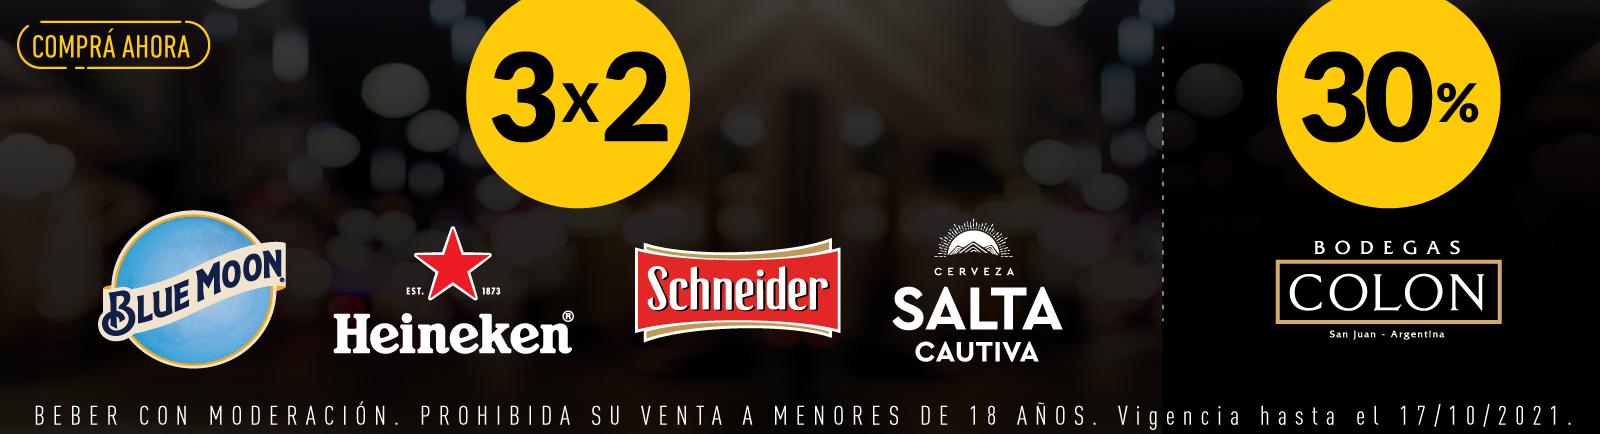 CCU - Cervezas 3x2 - Vinos 30% Off